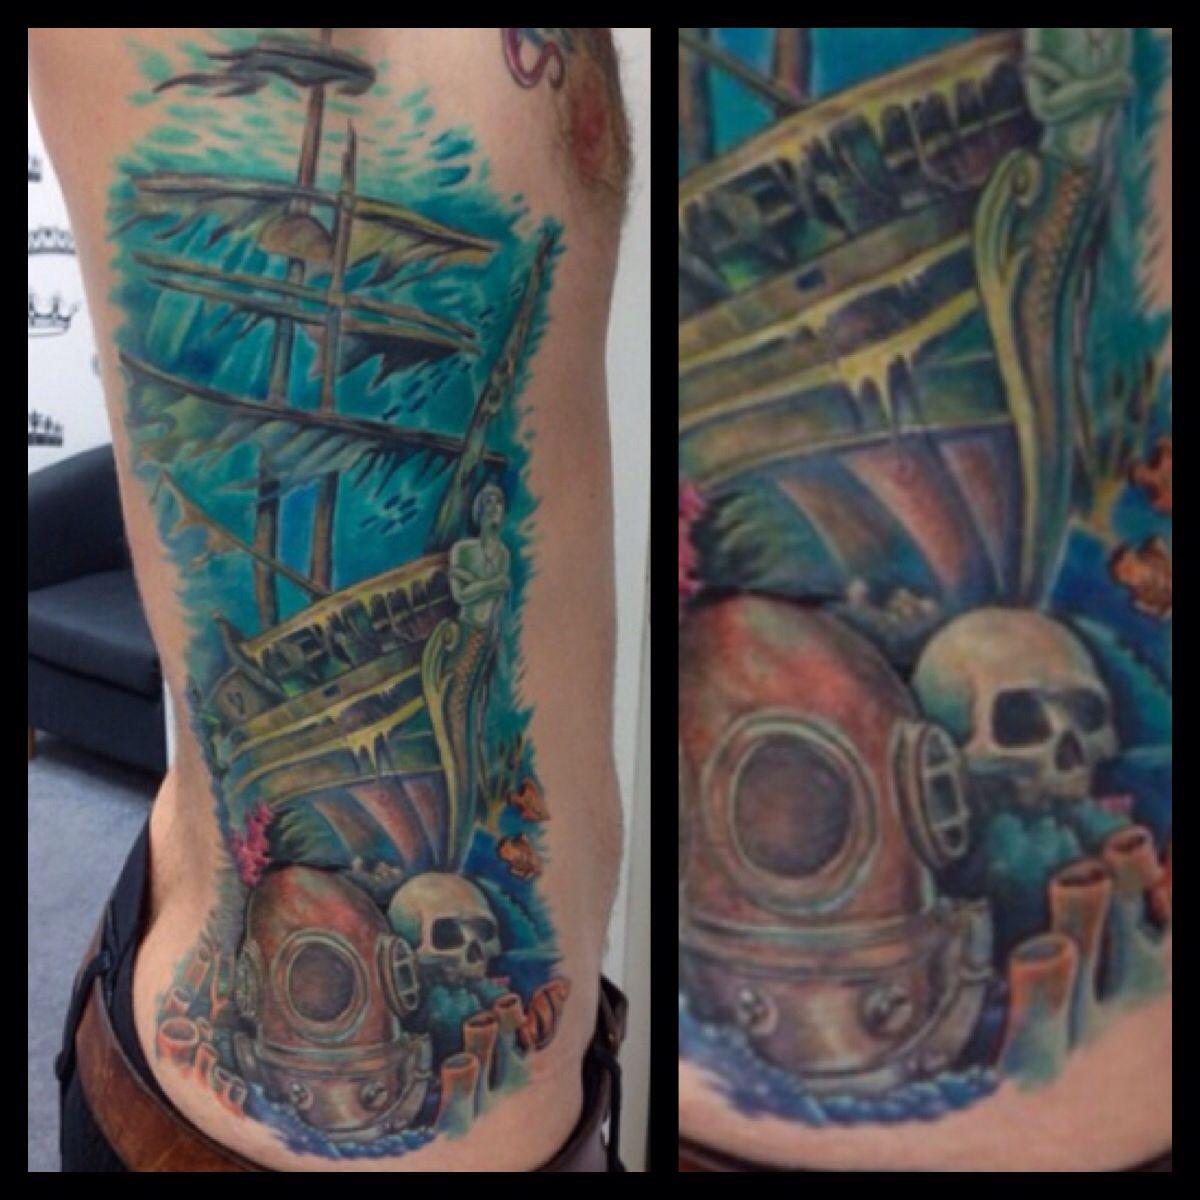 Underwater Shipwreck Tattoo Underwater shipwreck s...